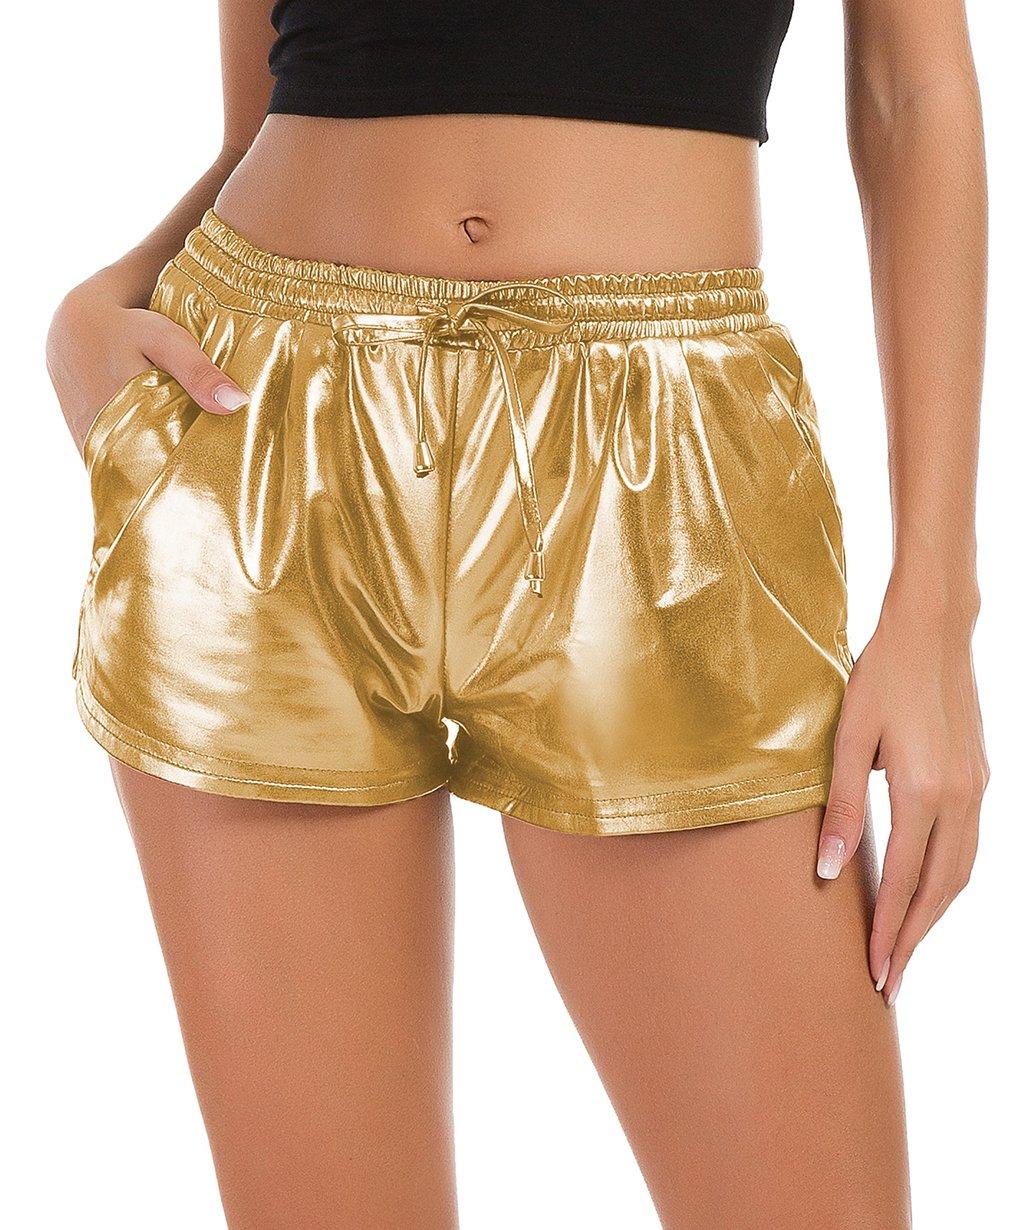 Tandisk Women's Yoga Hot Shorts Shiny Metallic Pants with Elastic Drawstring Gold M